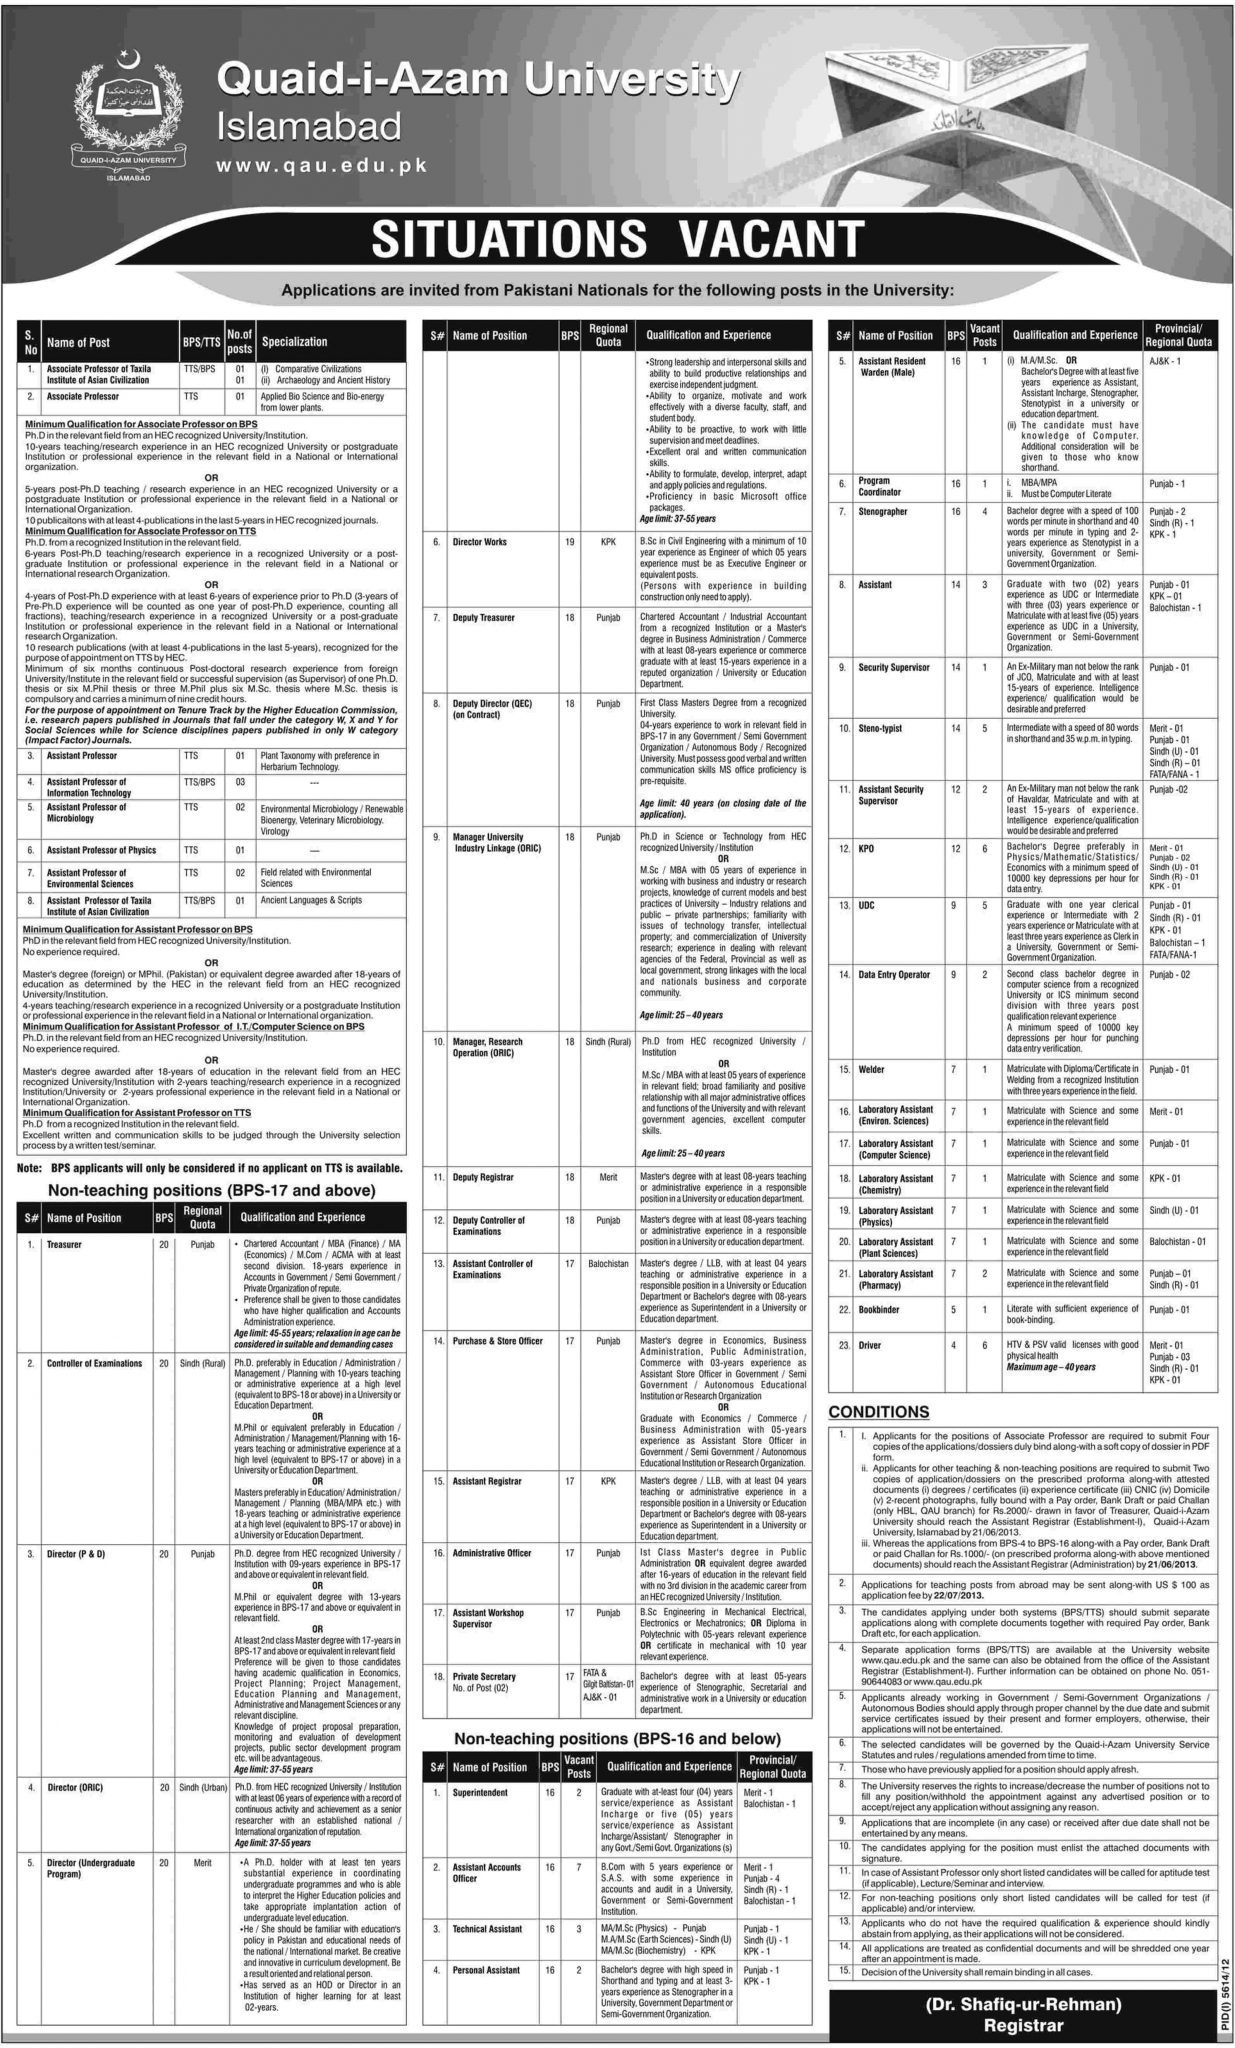 Directors & Supervisors Jobs in Quaid-e-Azam University Islamabad